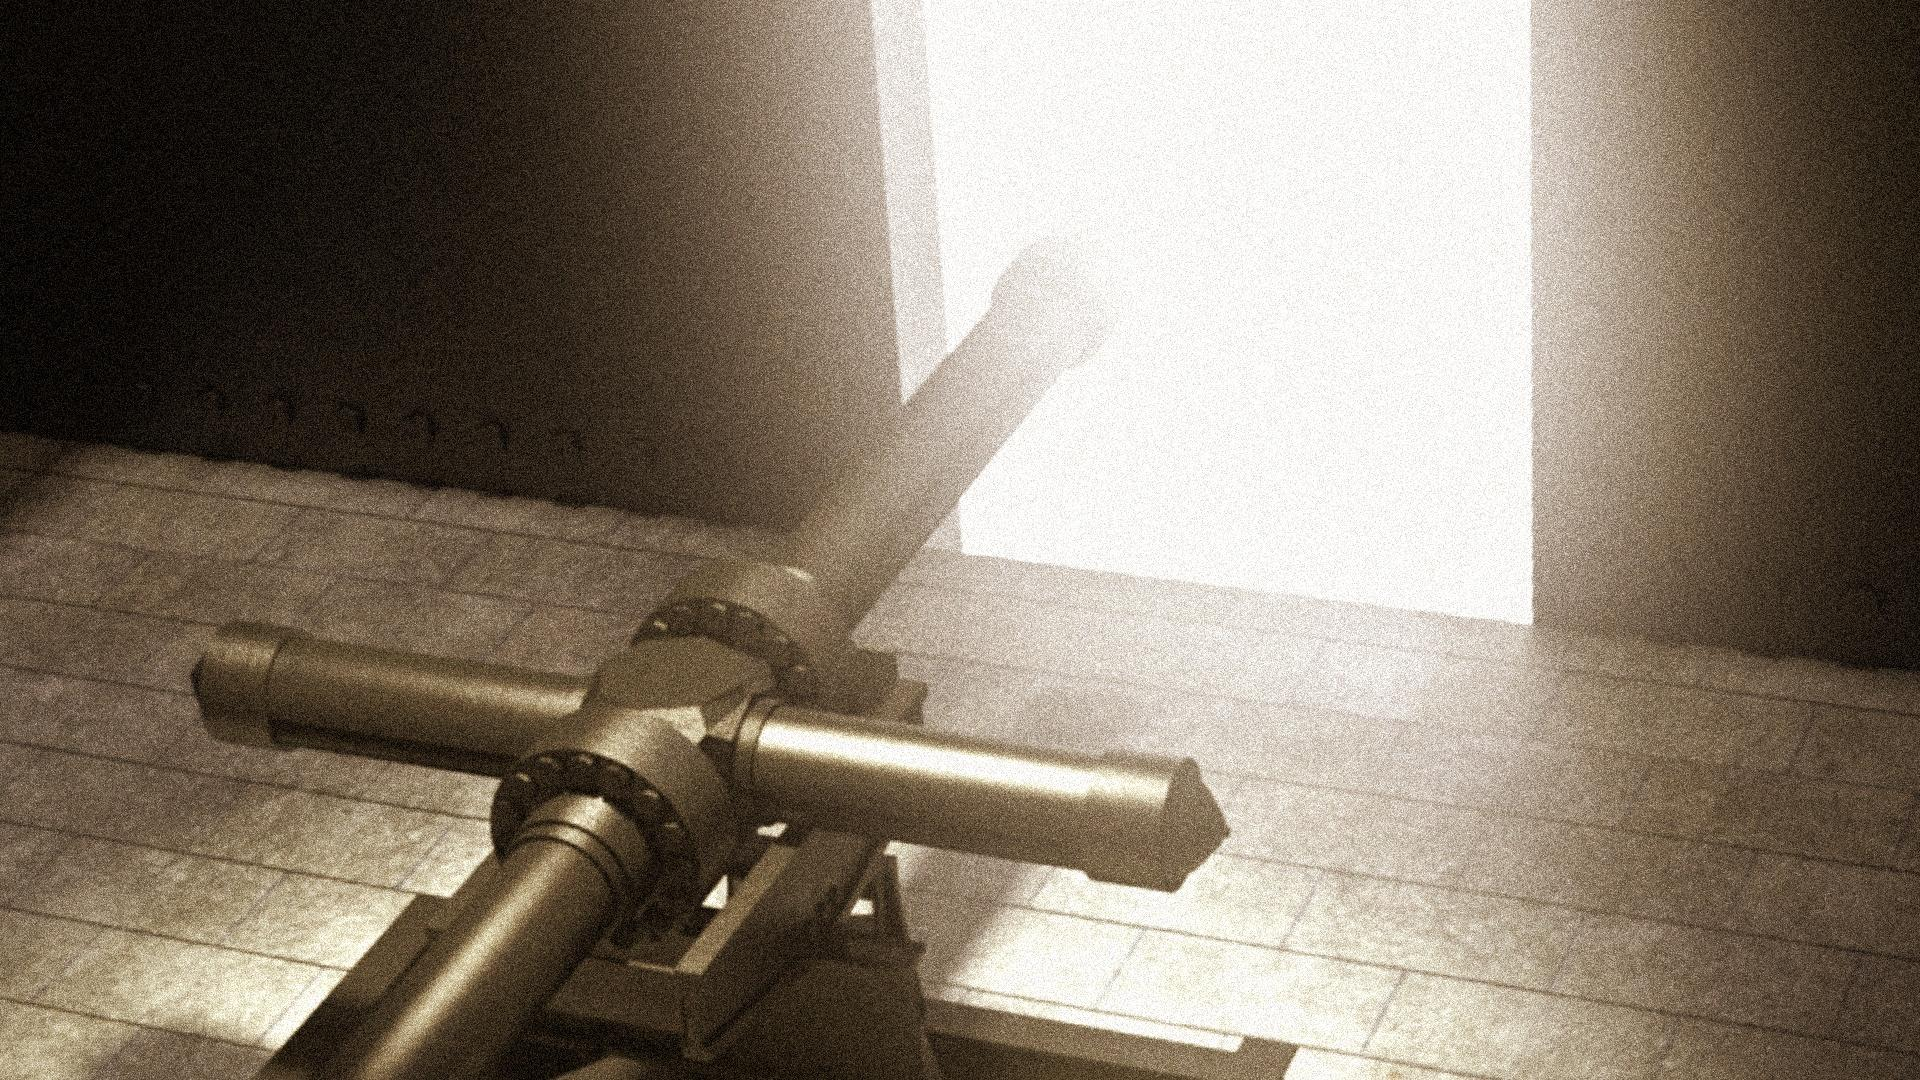 Bombing Hitler's Supergun